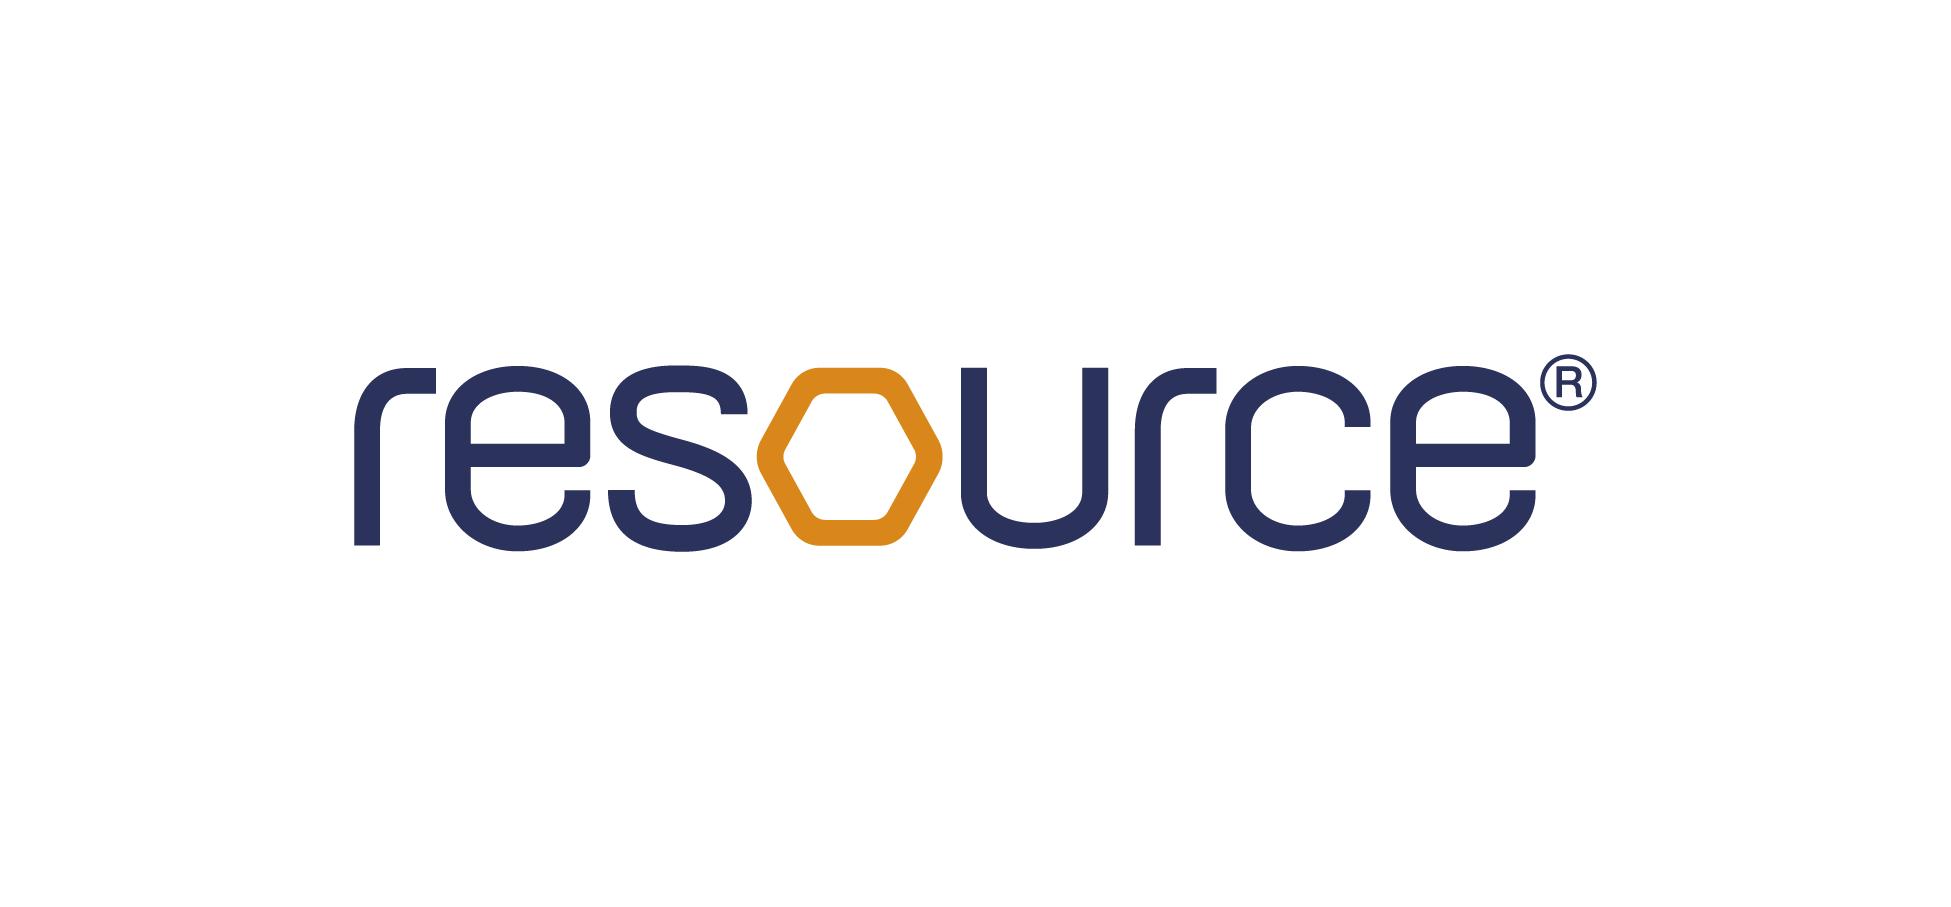 RESOURCE™